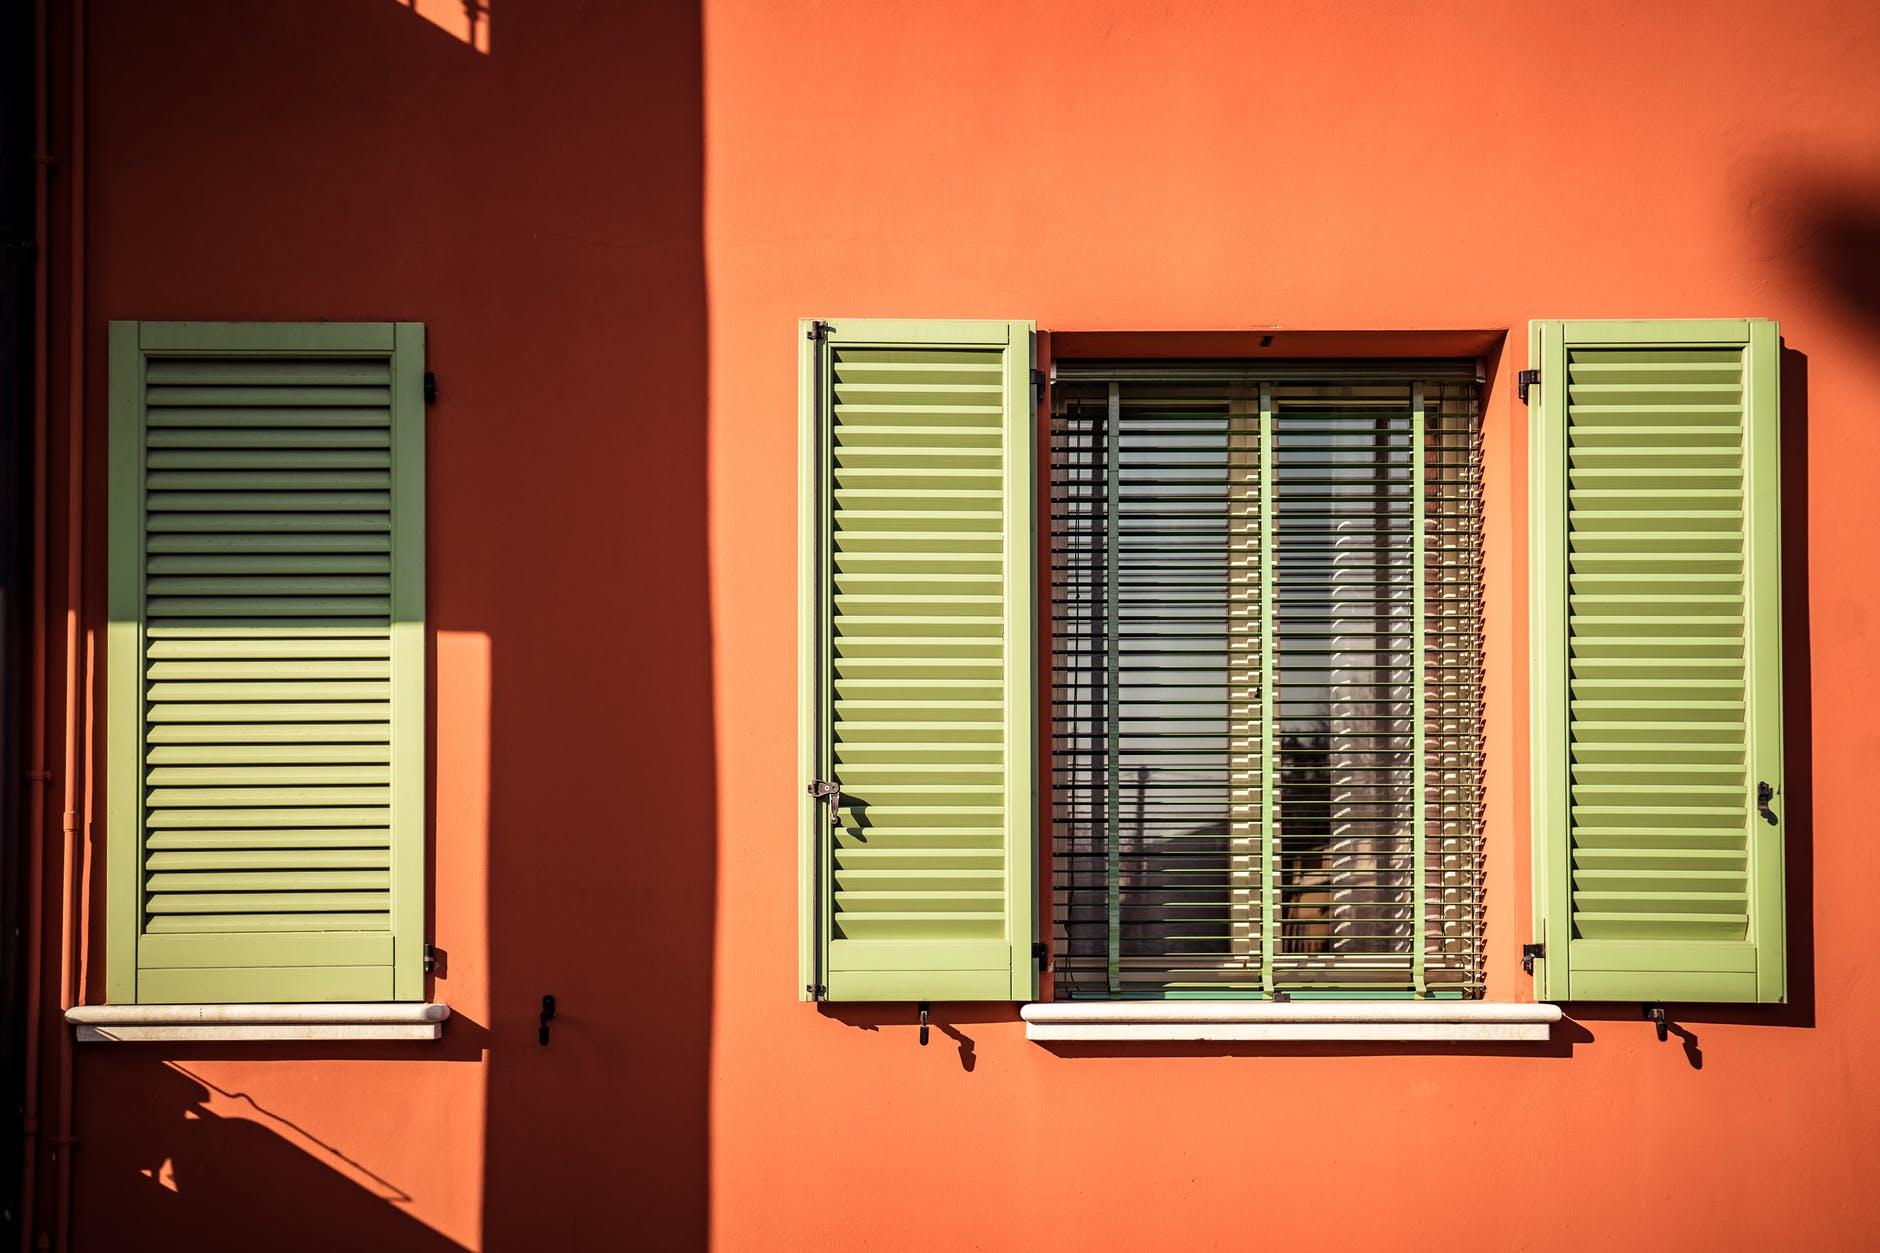 Fenêtres - Volets